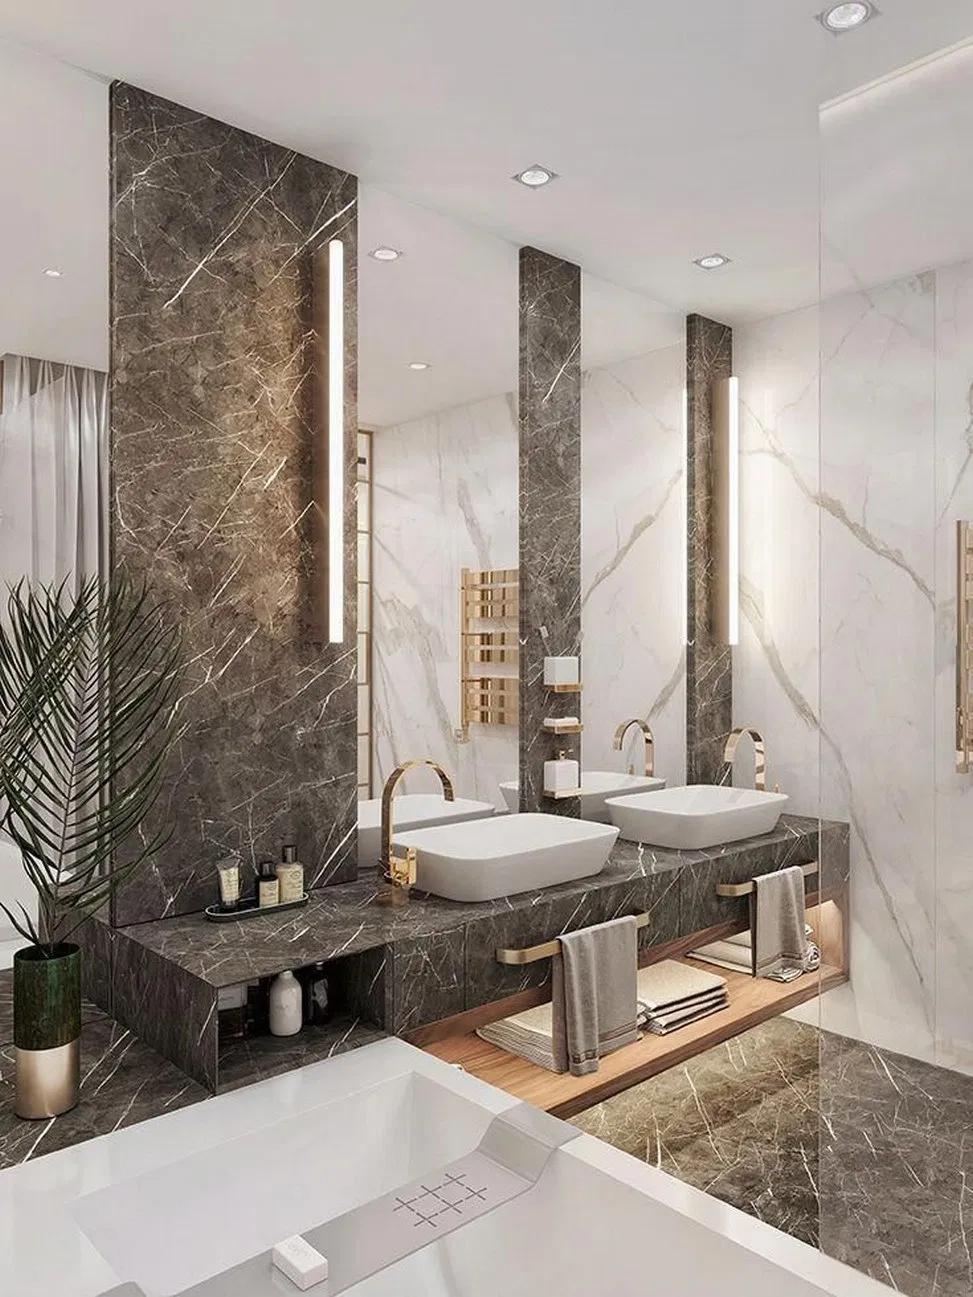 32 Interior Design Using Moody Colours And Natural Materials 4 Megasiana Com Bathroominterior Modern Bathroom Design Bathroom Design Luxury Luxury Bathroom